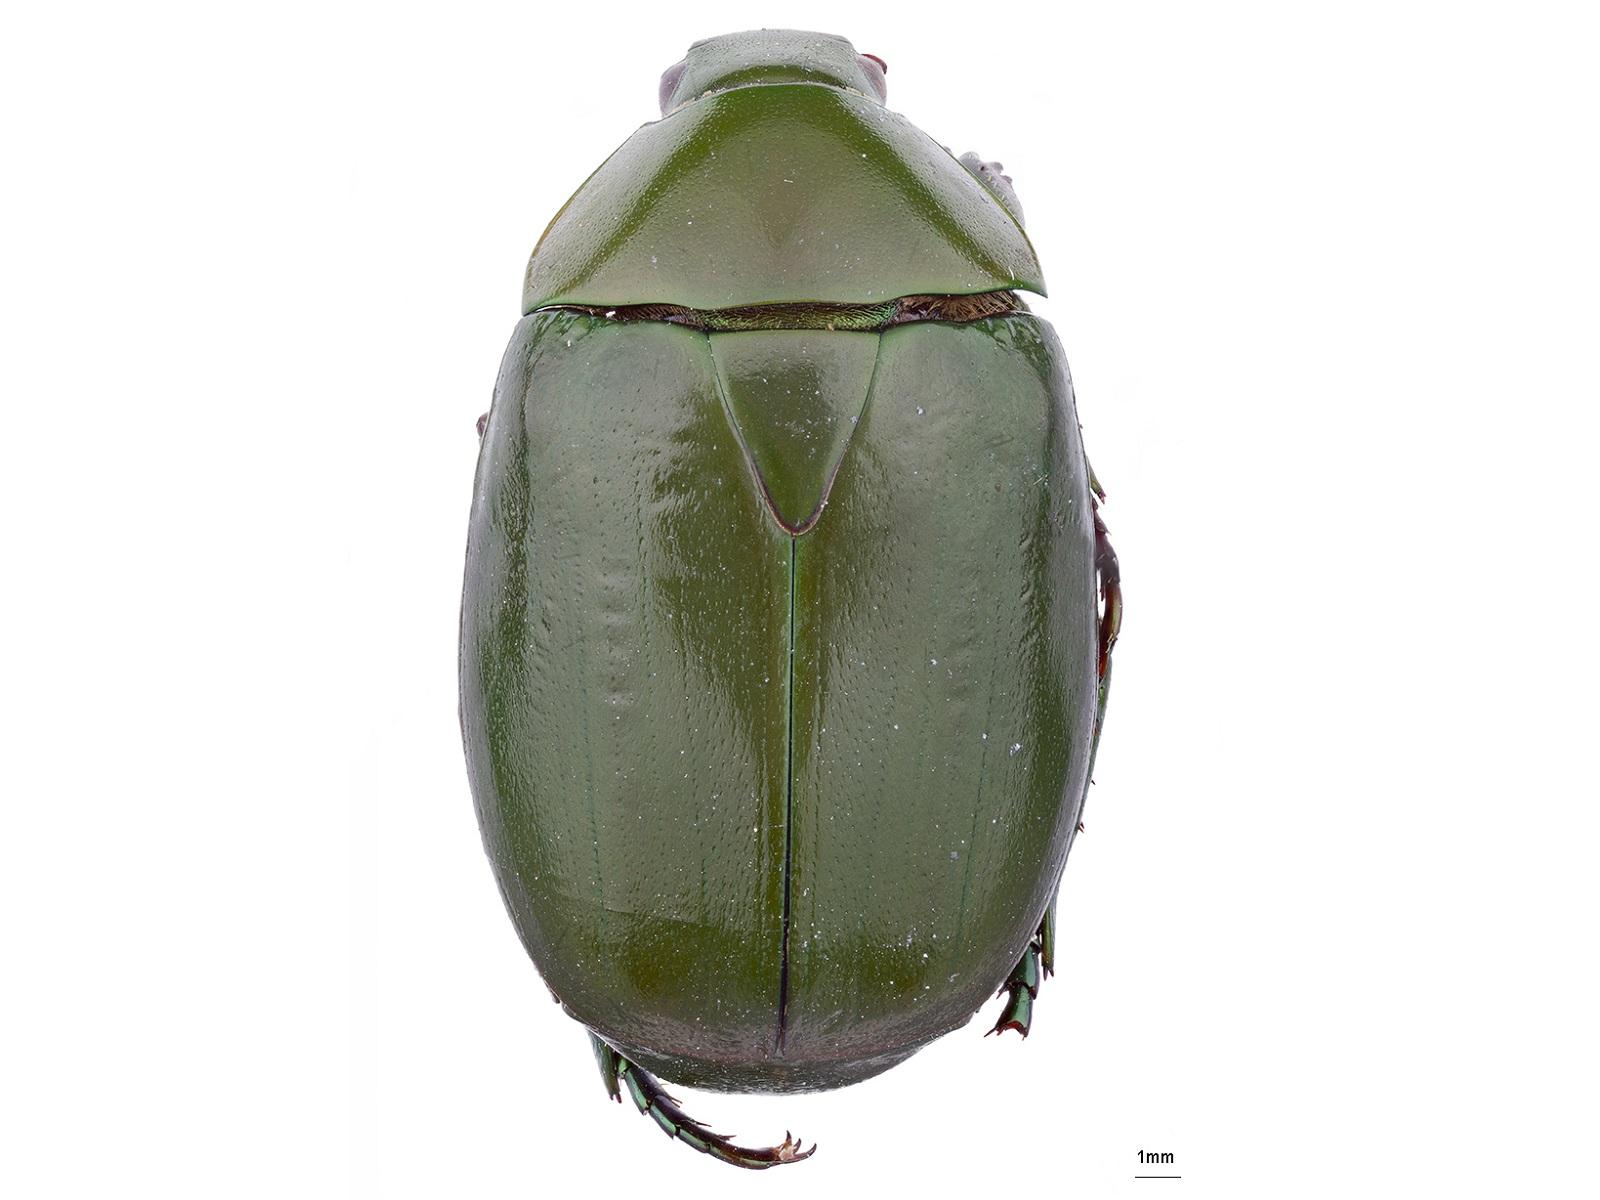 Ptenomela columbica Ohaus, 1908